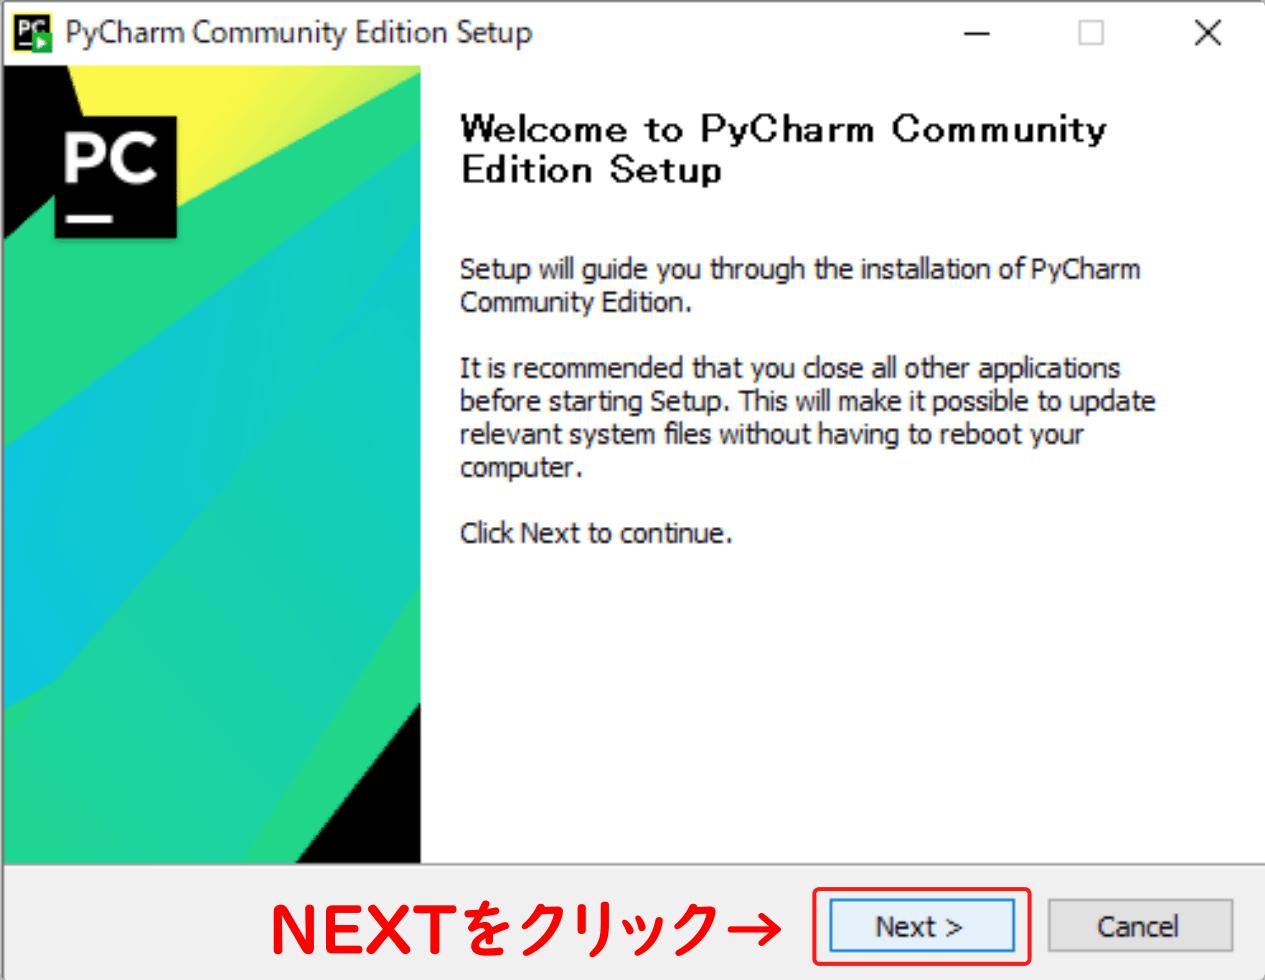 PyCharmのインストール画面